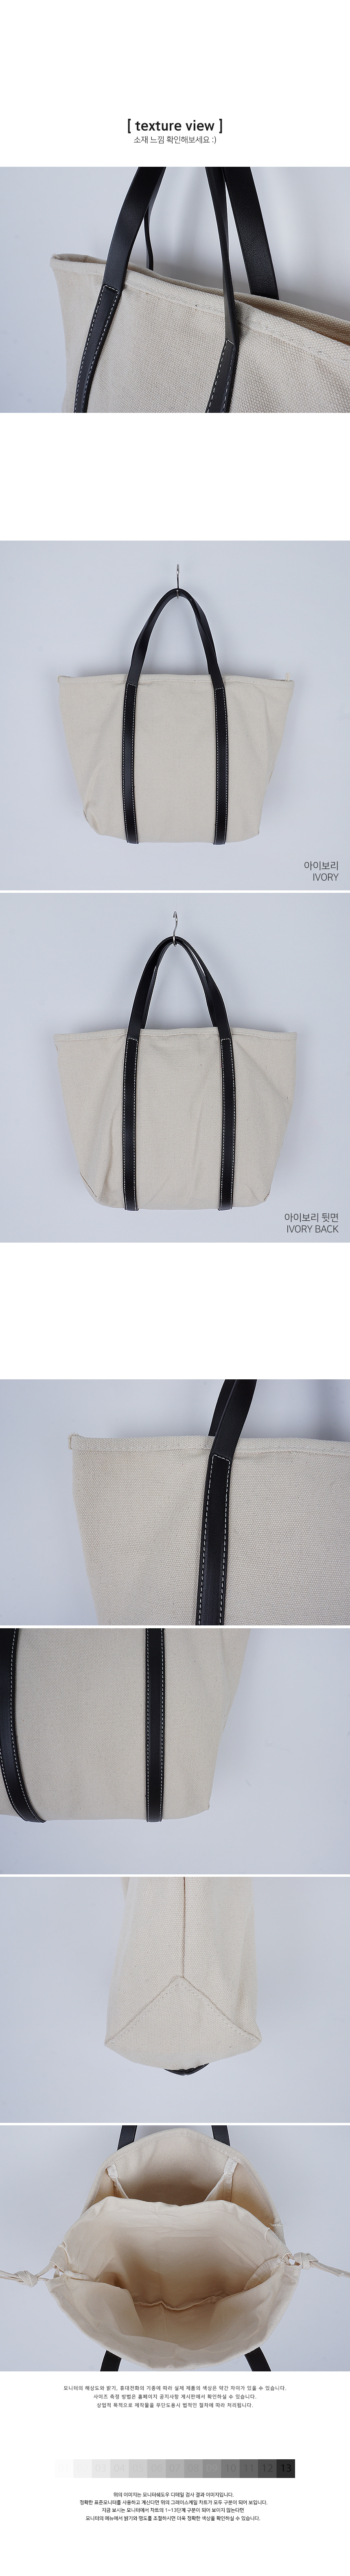 Leather strap tote